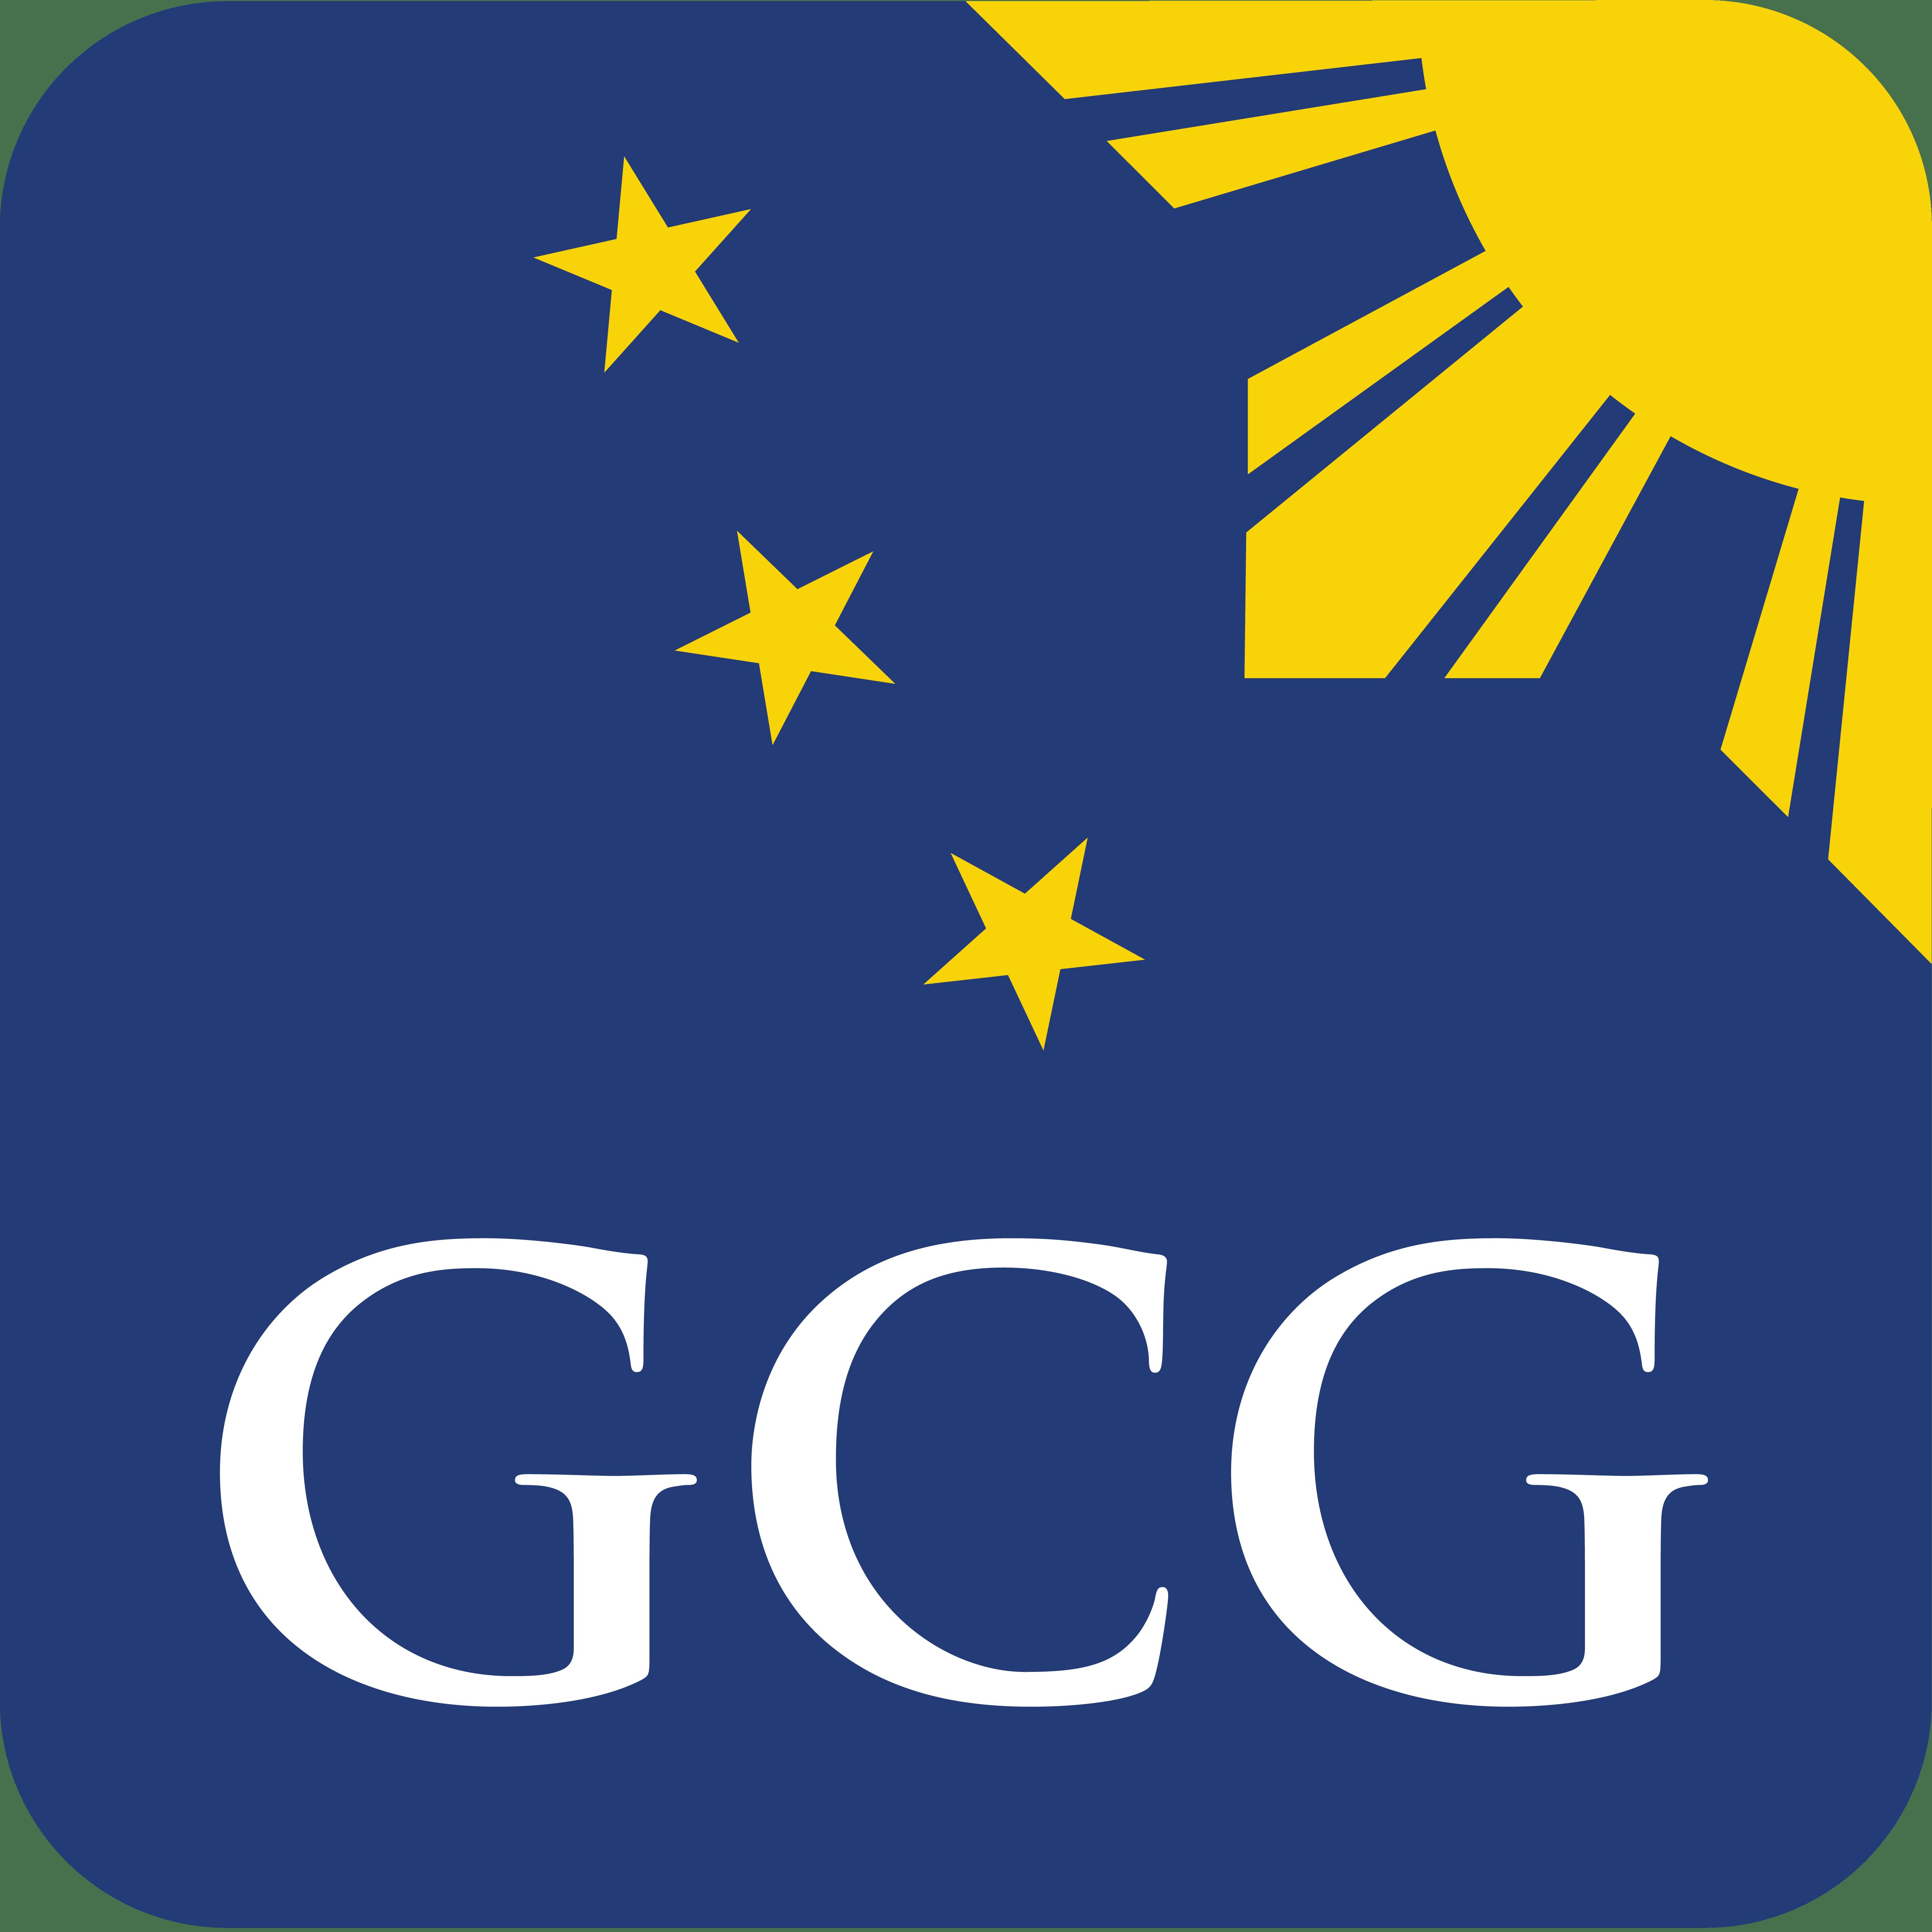 GCG ICRS